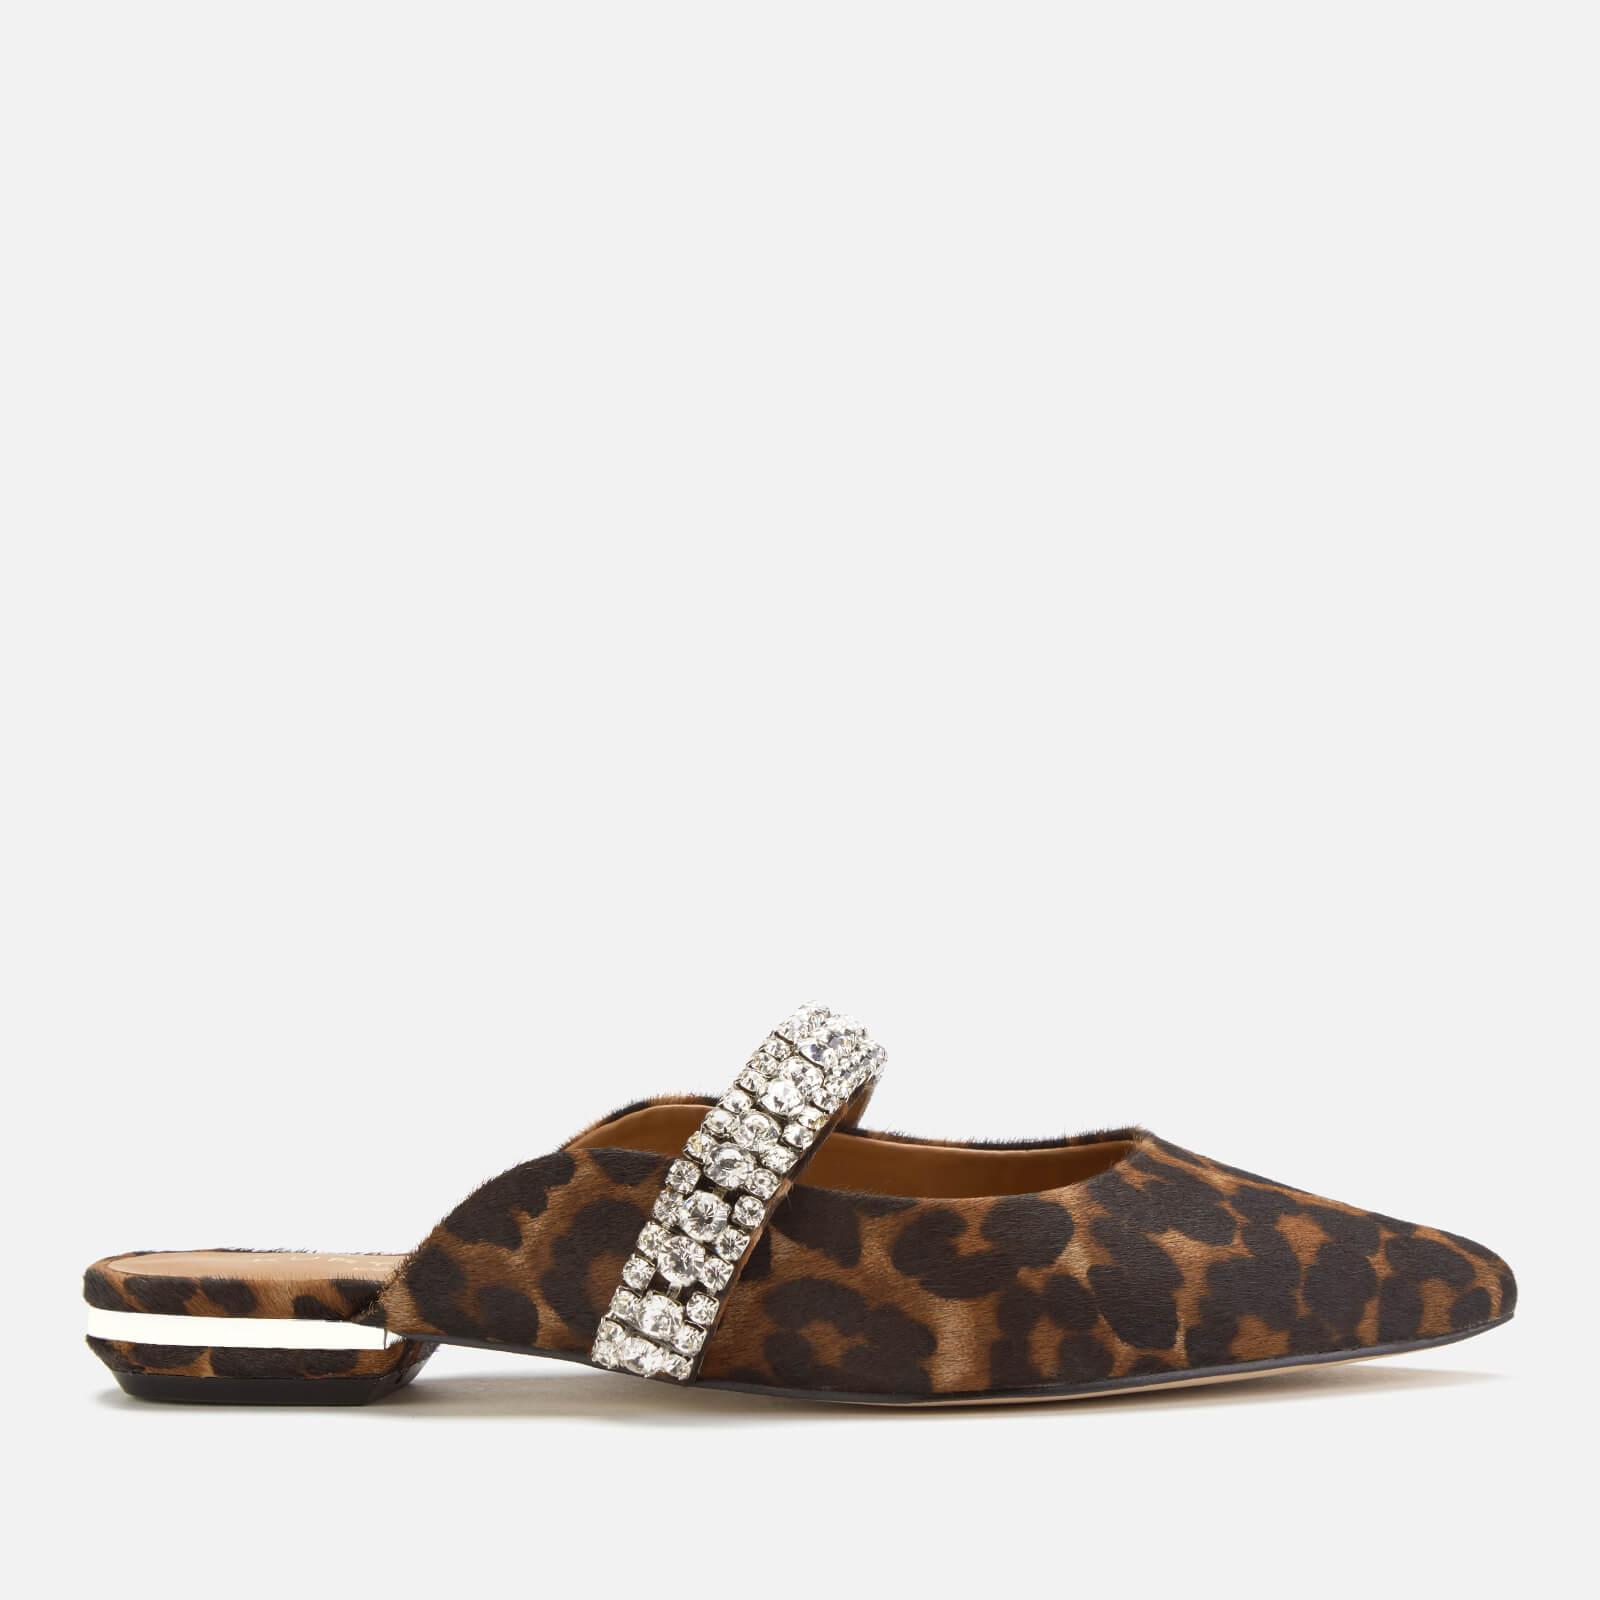 Kurt Geiger London Women's Princely Flat Mules - Cream Comb - UK 5 - Tan